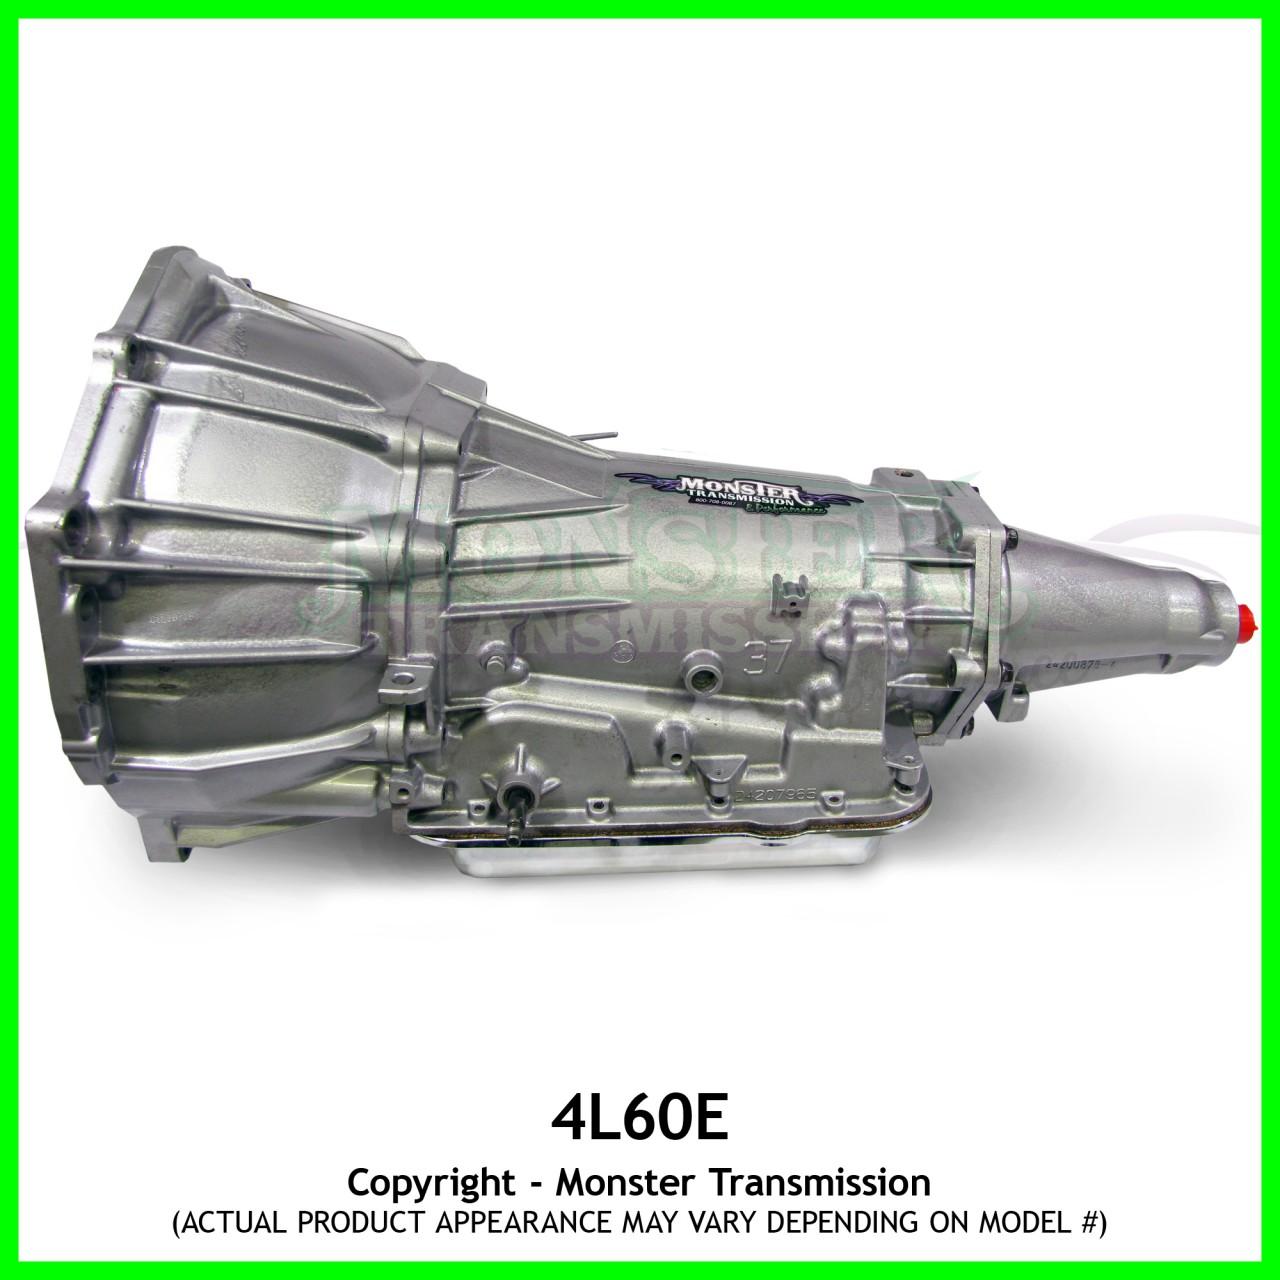 4l60e transmission remanufactured heavy duty performance 2pc case 2wd rh monstertransmission com GM 4L85E GM 4L80E Transmission